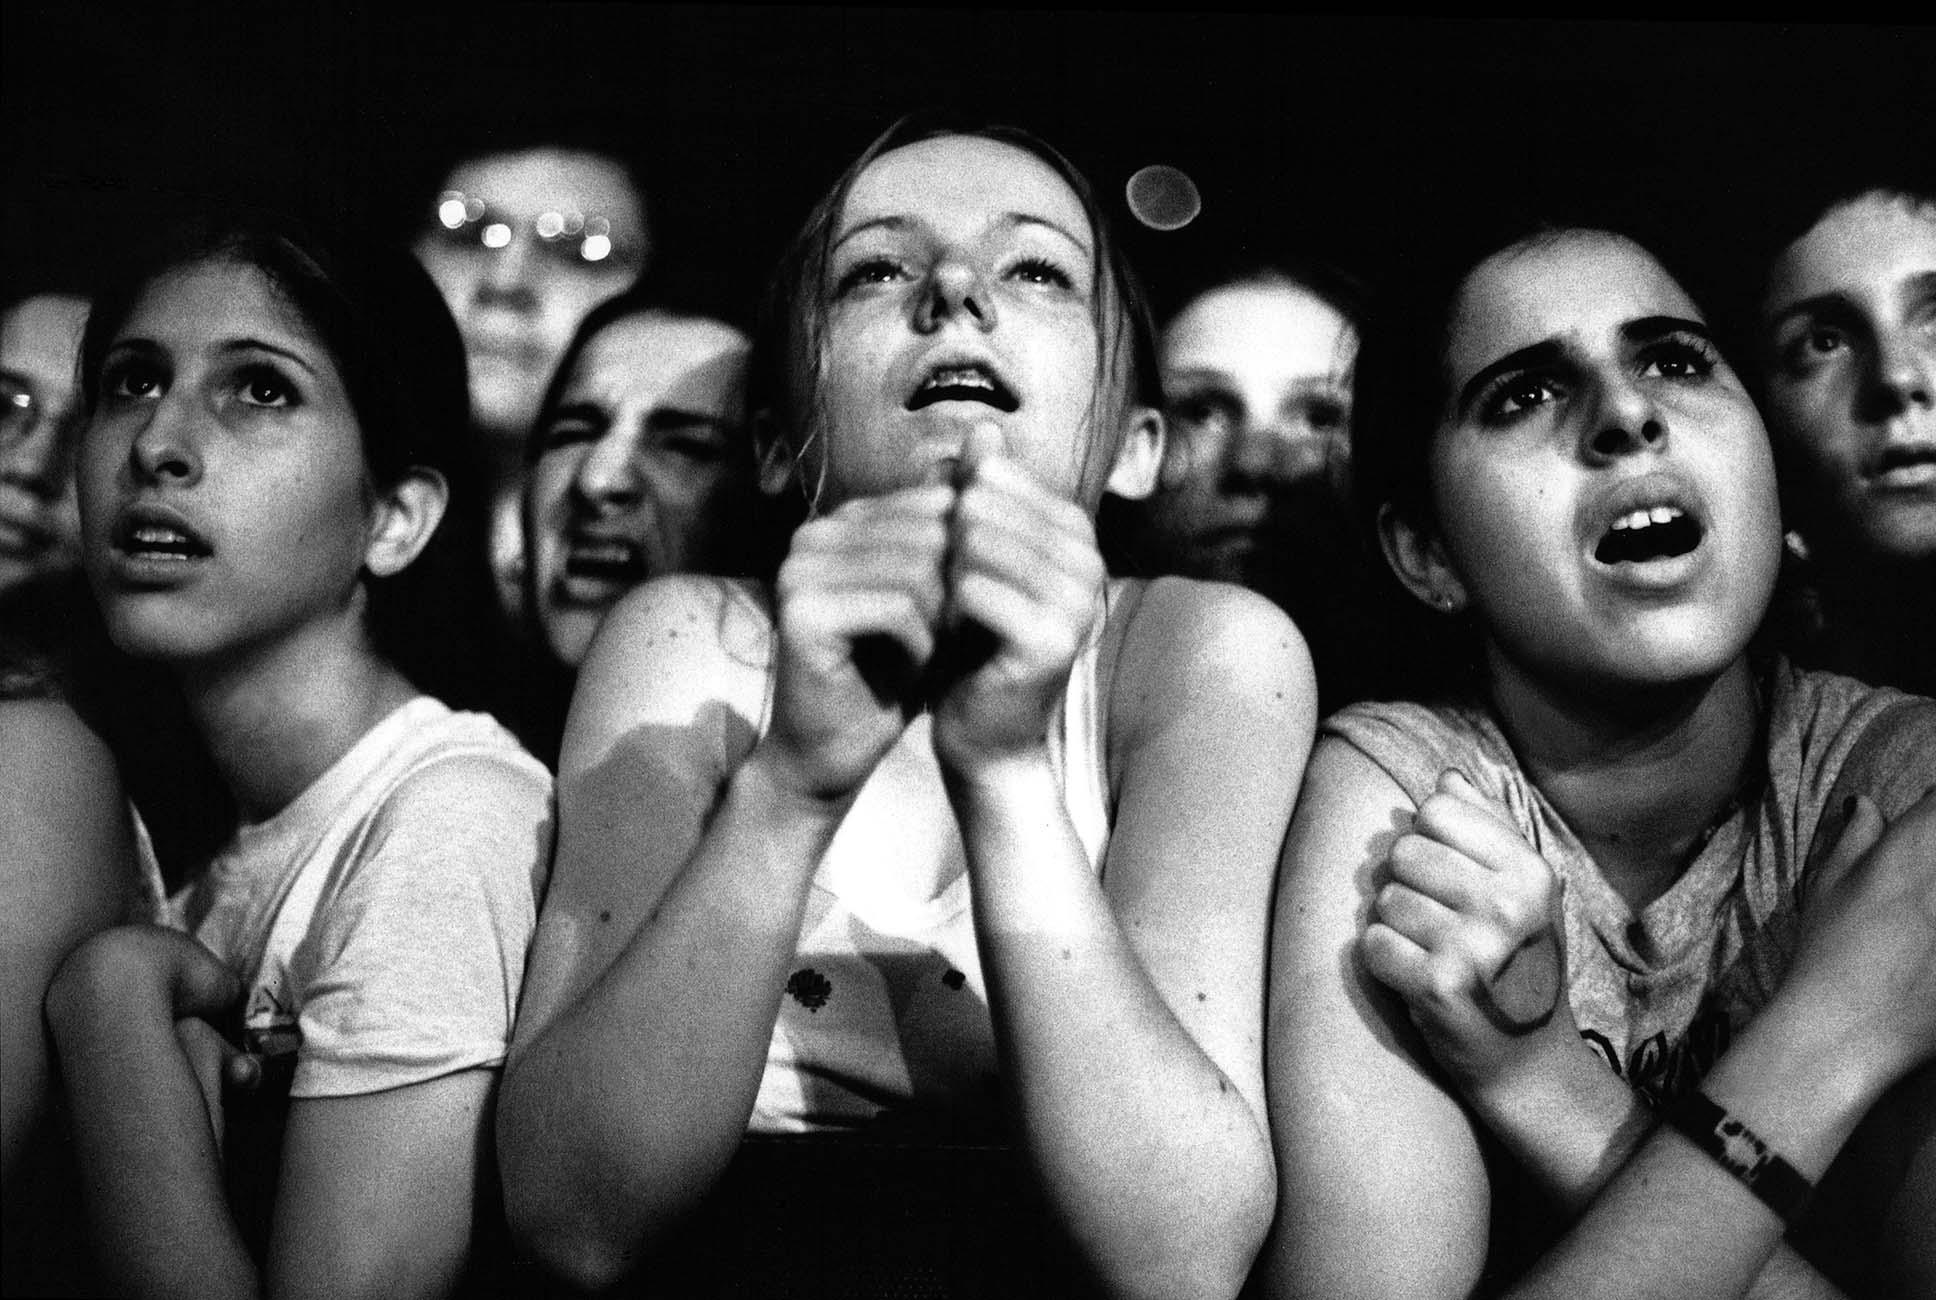 Fans - photo by Leslie Fratkin